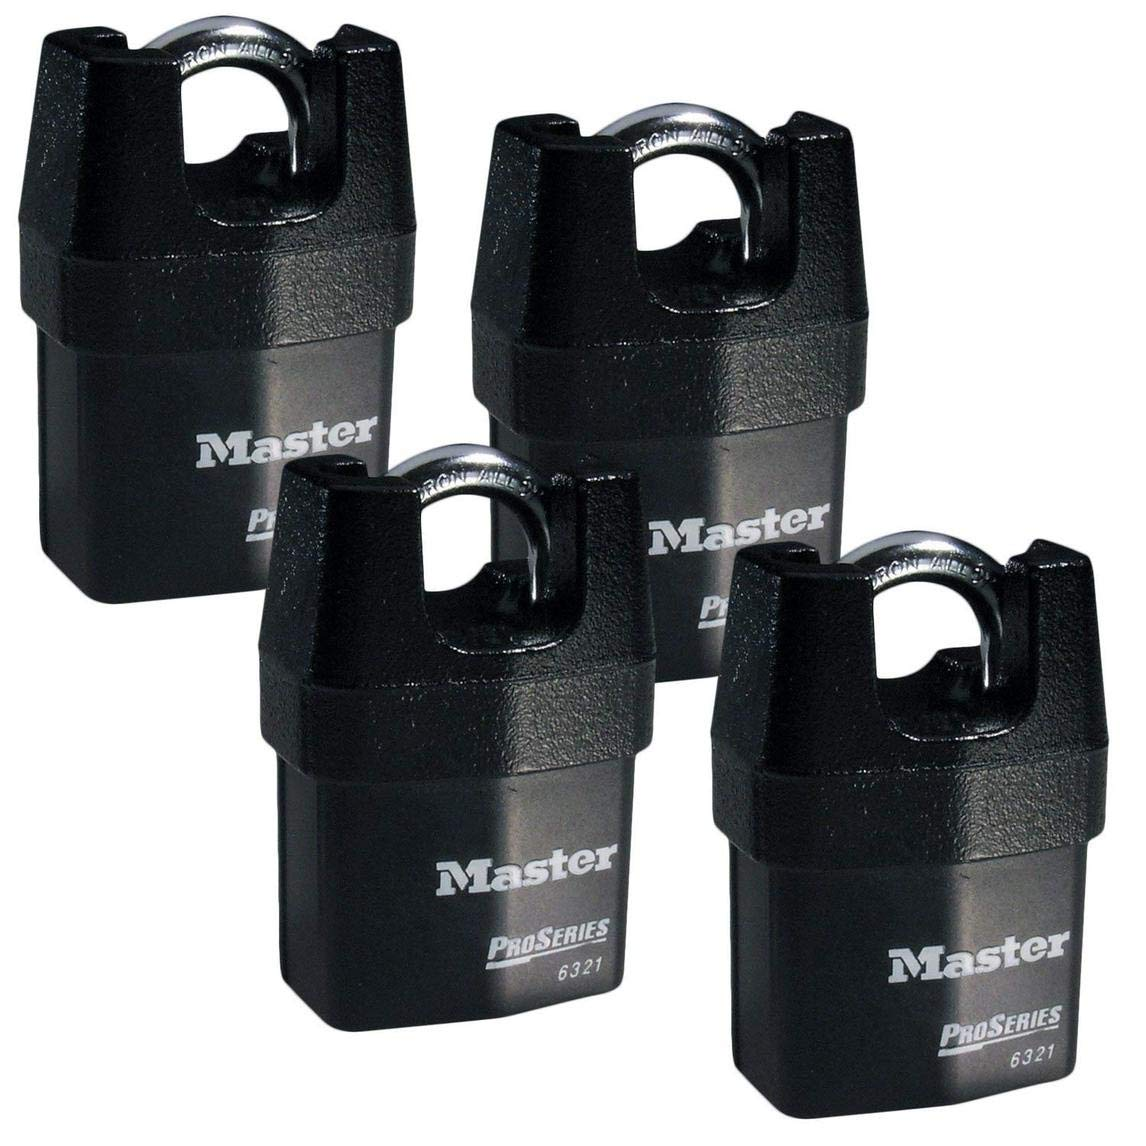 Master Lock - Four (4) High Security Pro Series Padlocks 6321NKA-4 w/ BumpStop Technology.